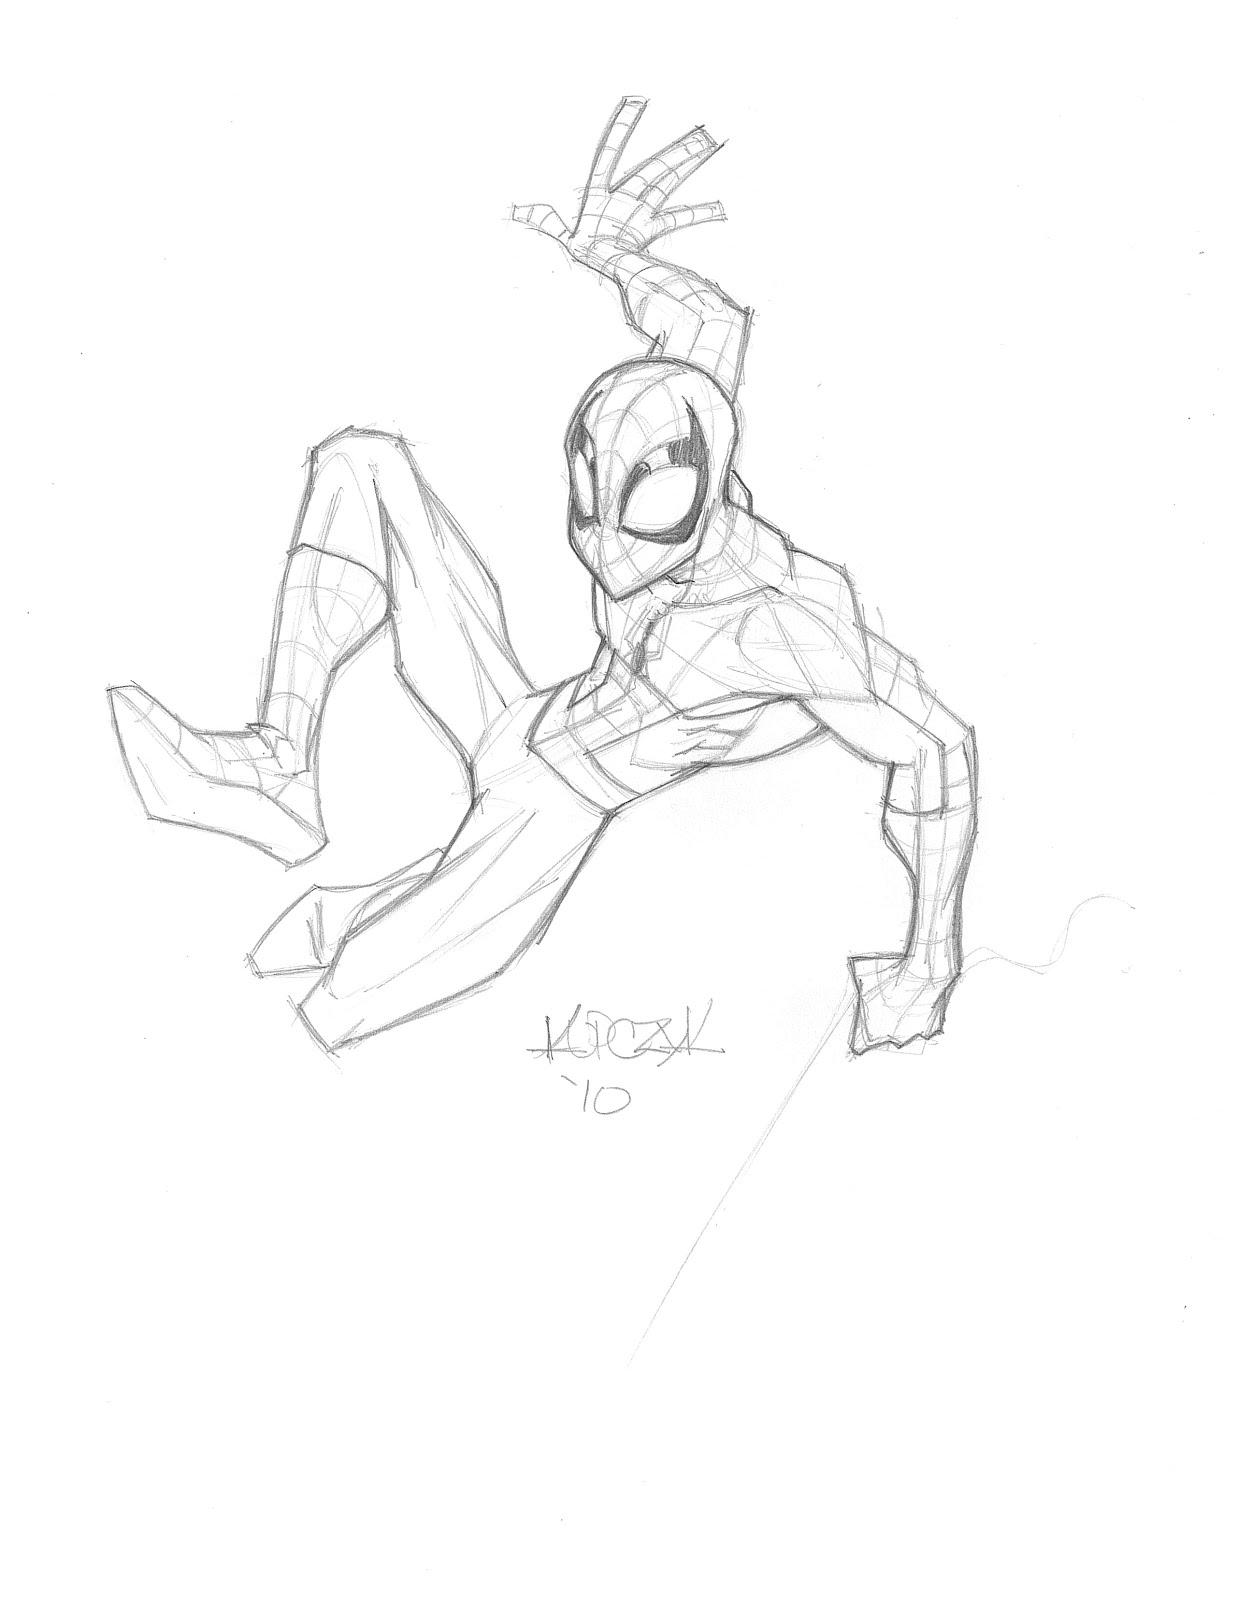 Dave's blog: Ultimate Spiderman version 1